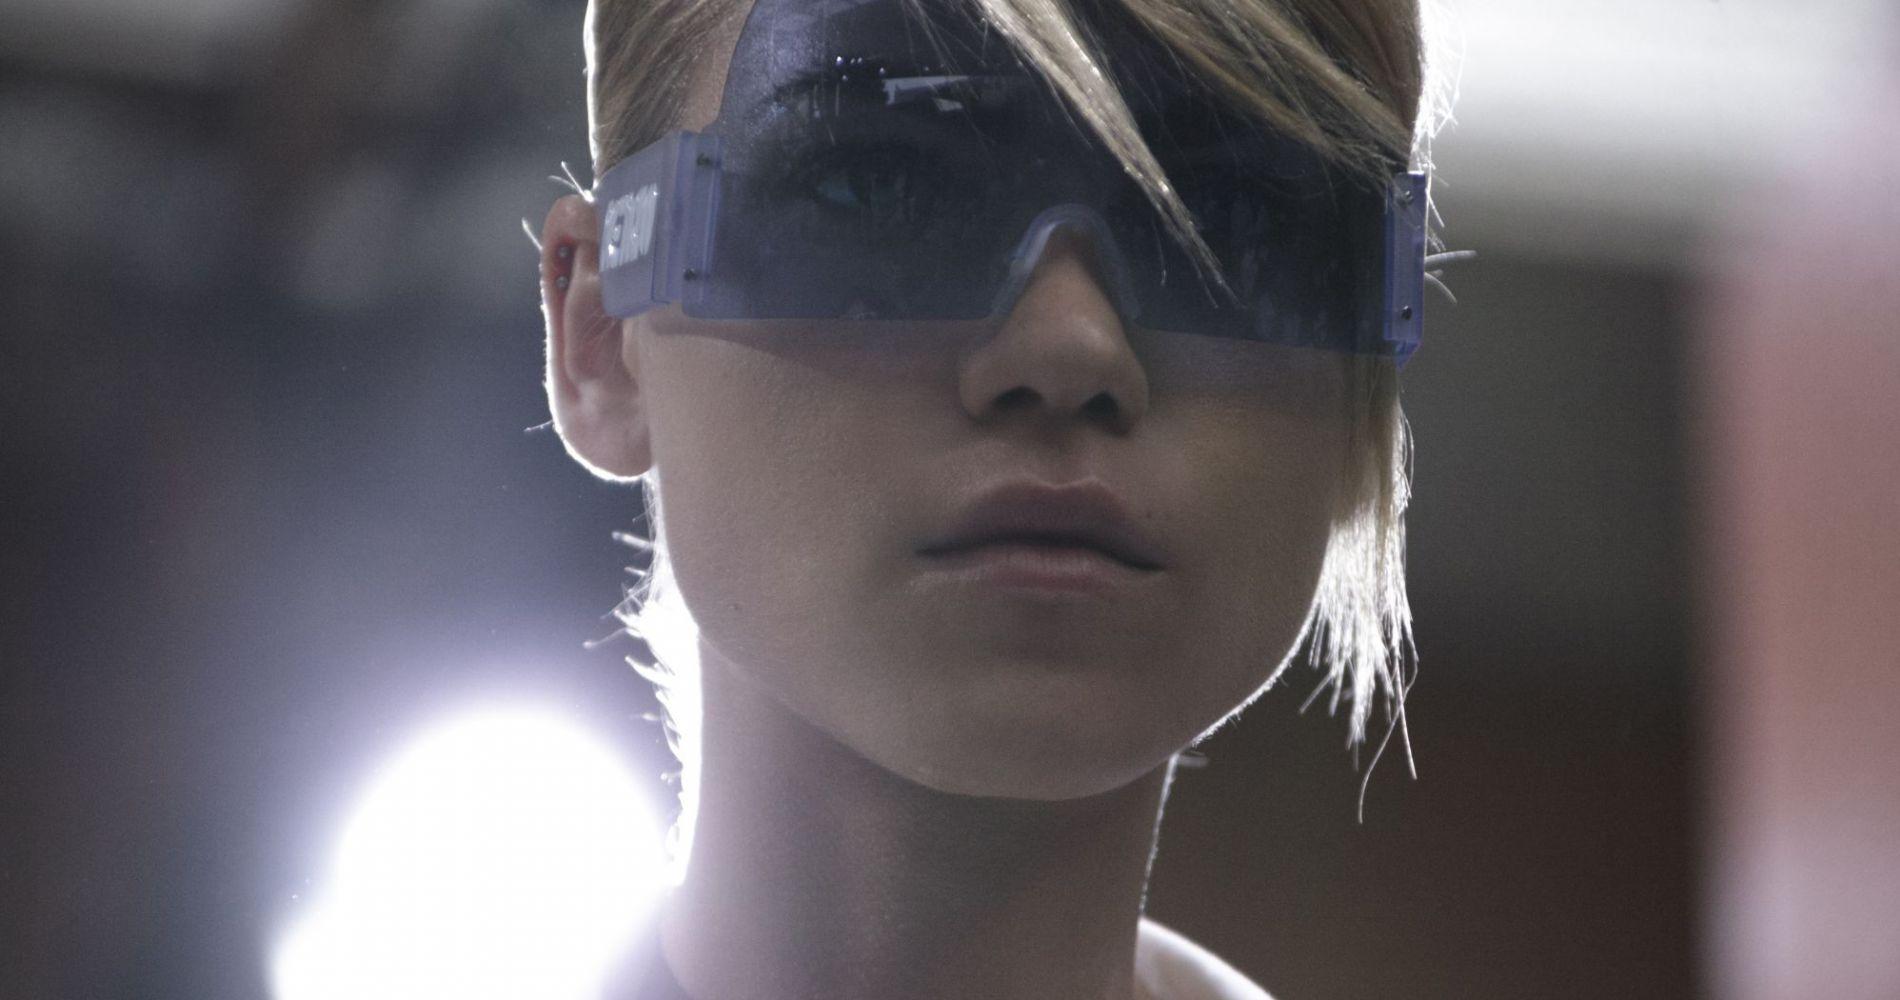 La femme futuriste selon Kenzo